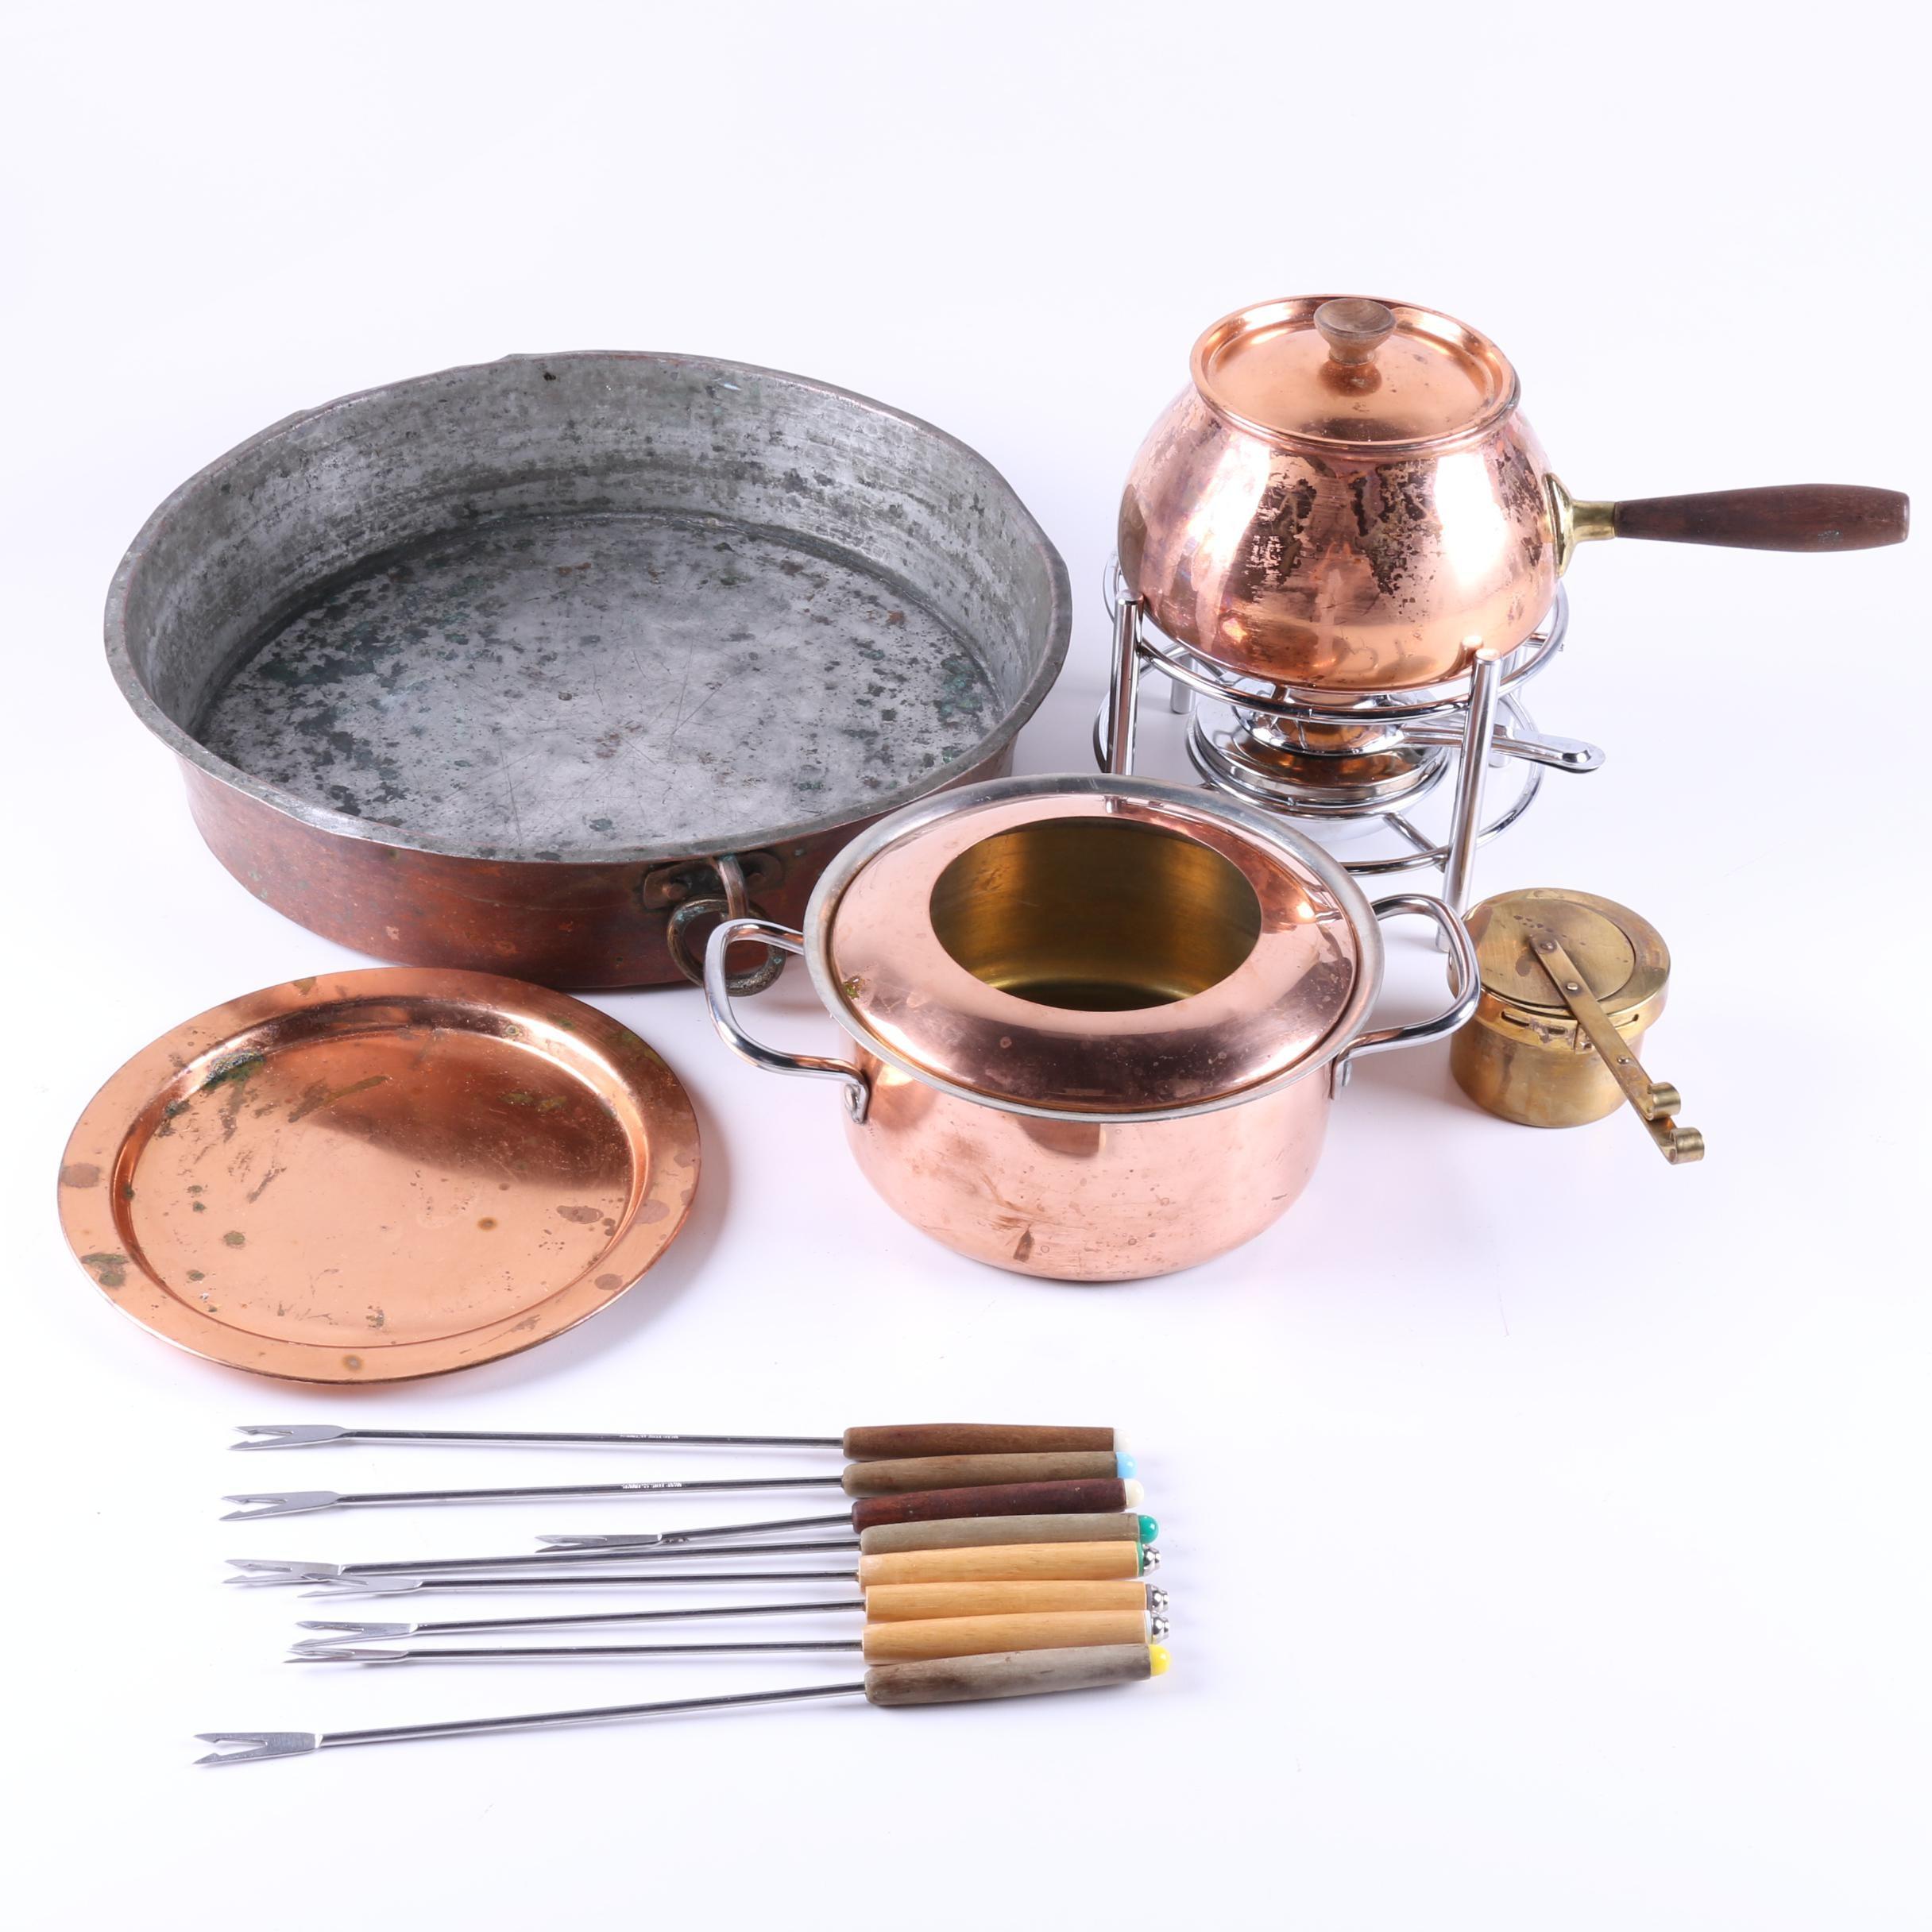 Copper Cookware and Fondue Set